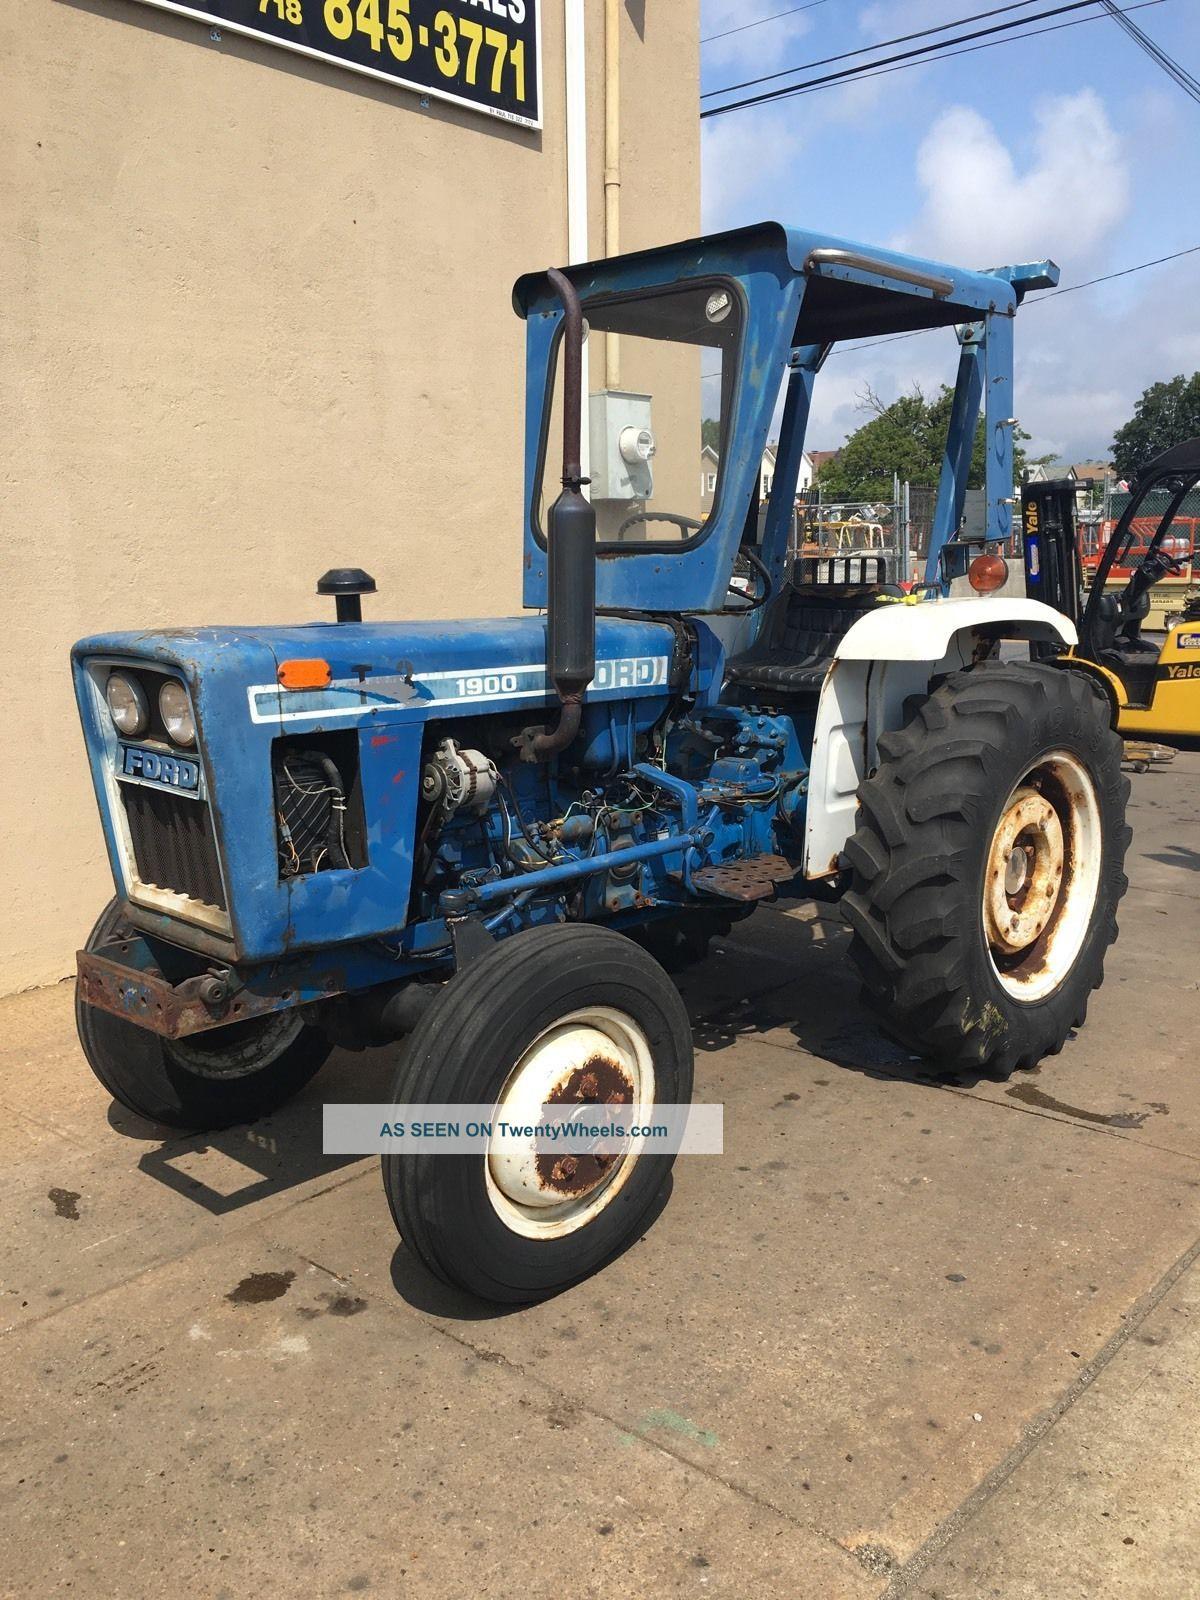 2 Wheel Tractor 1900 : Ford farm tractor